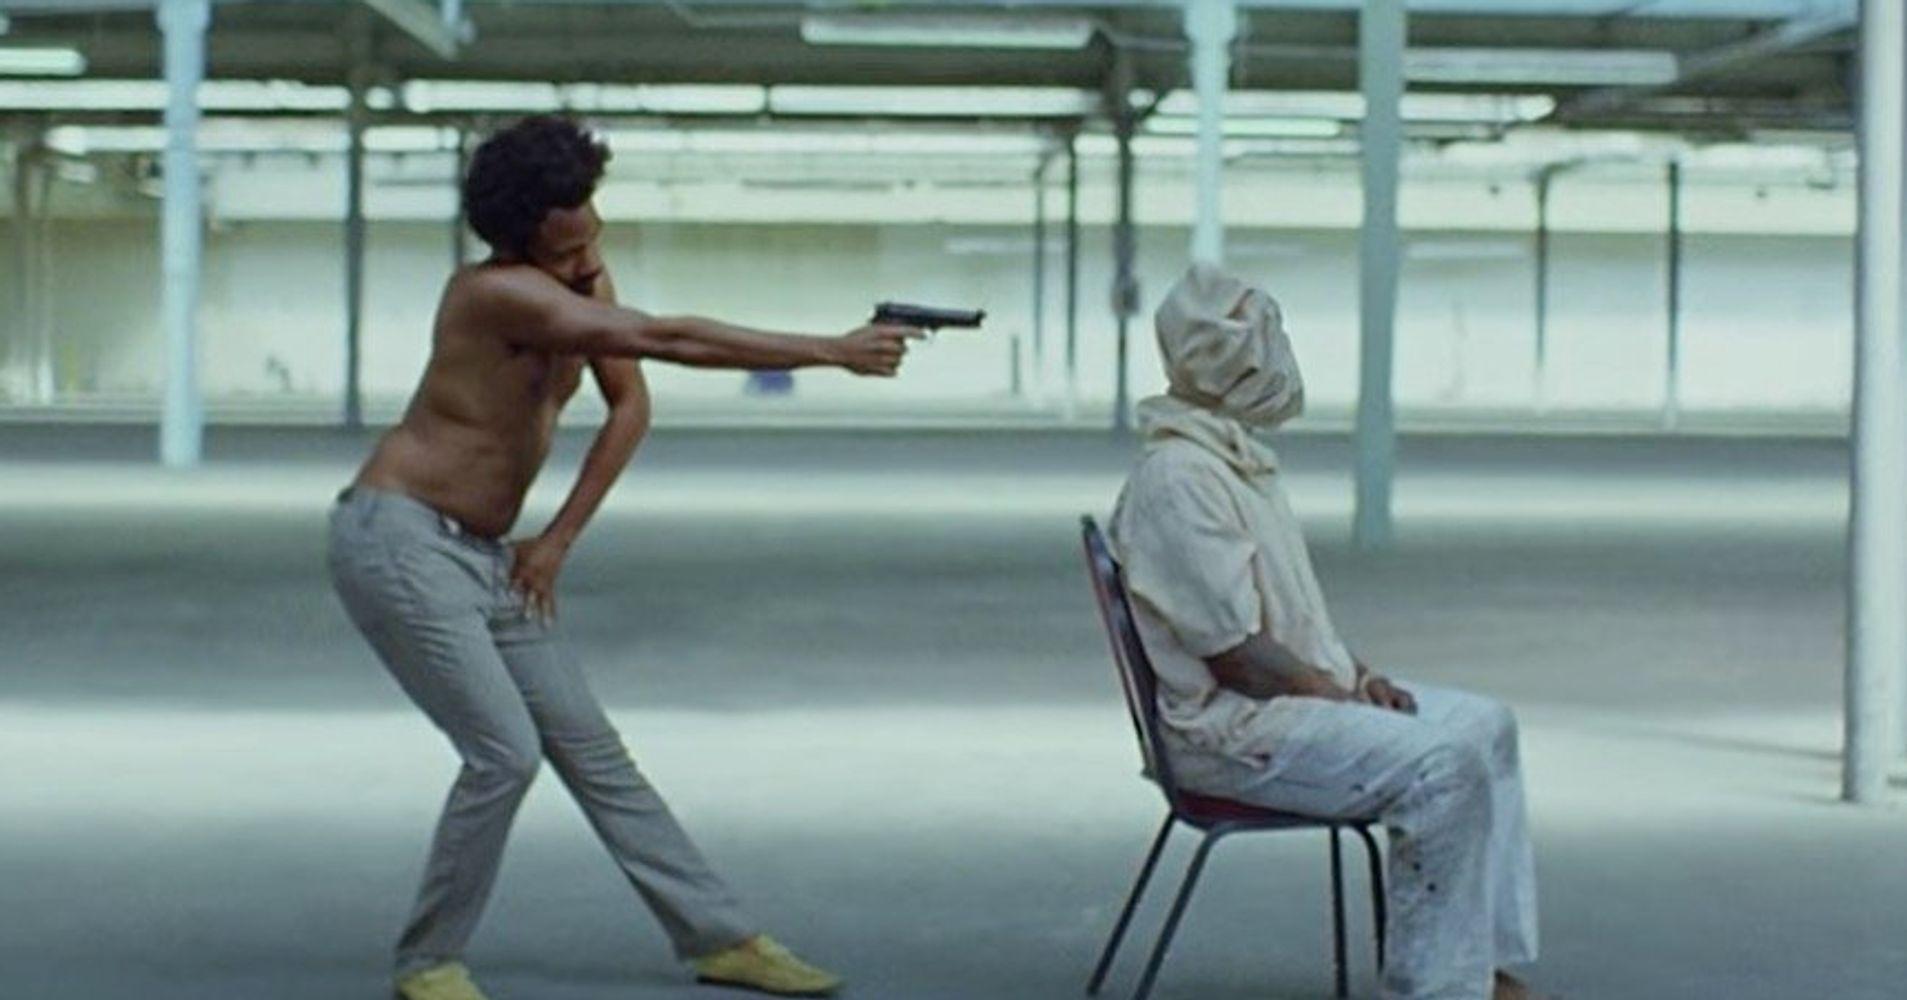 Childish Gambino's 'This Is America' Hits No. 1 Spot In ...